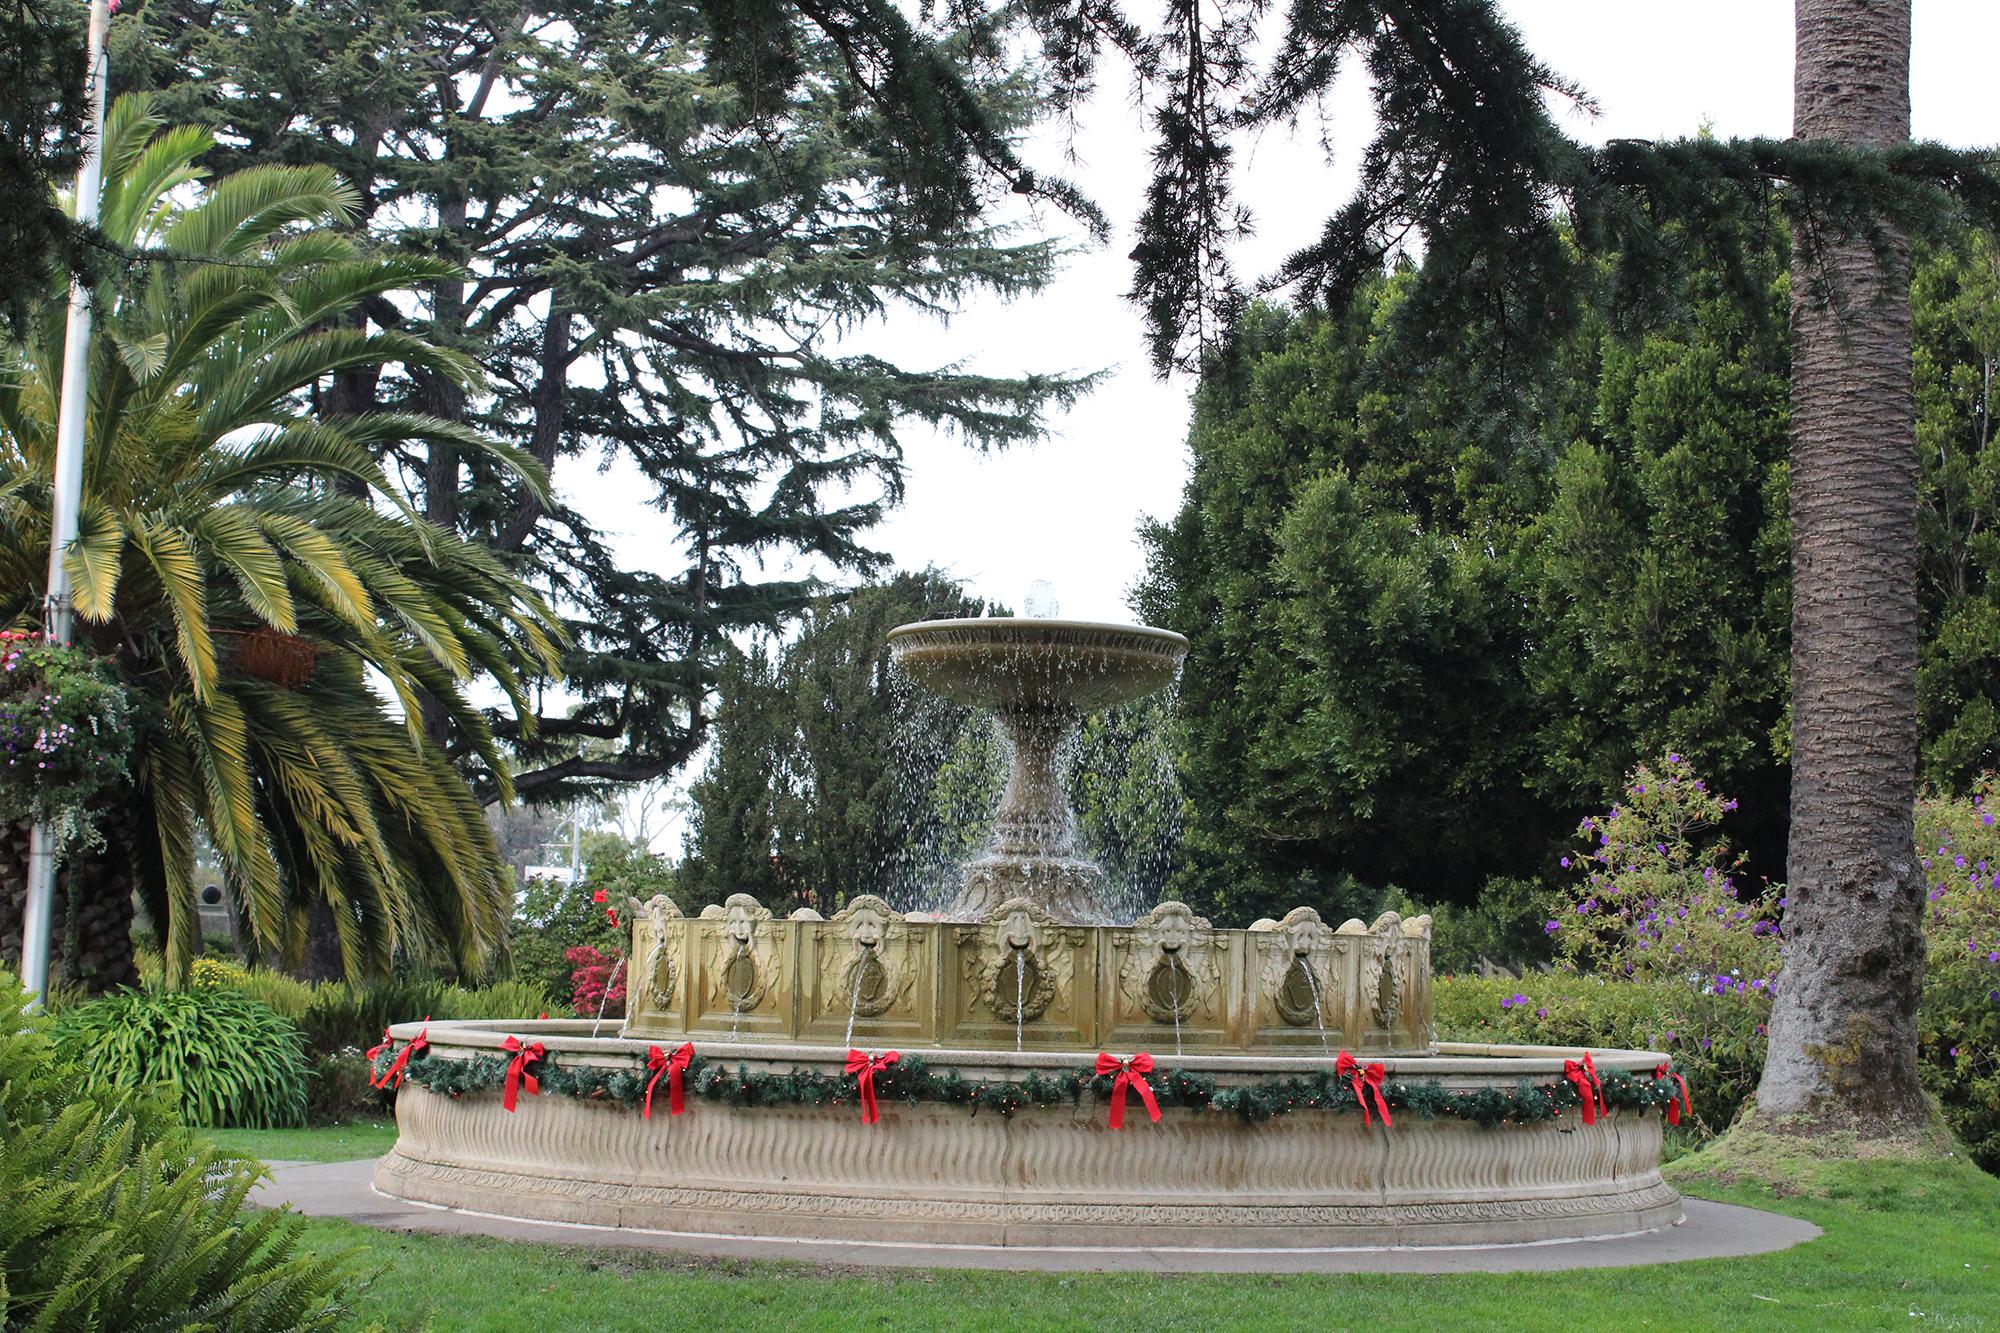 2nd. Callie June, Festive Fountain